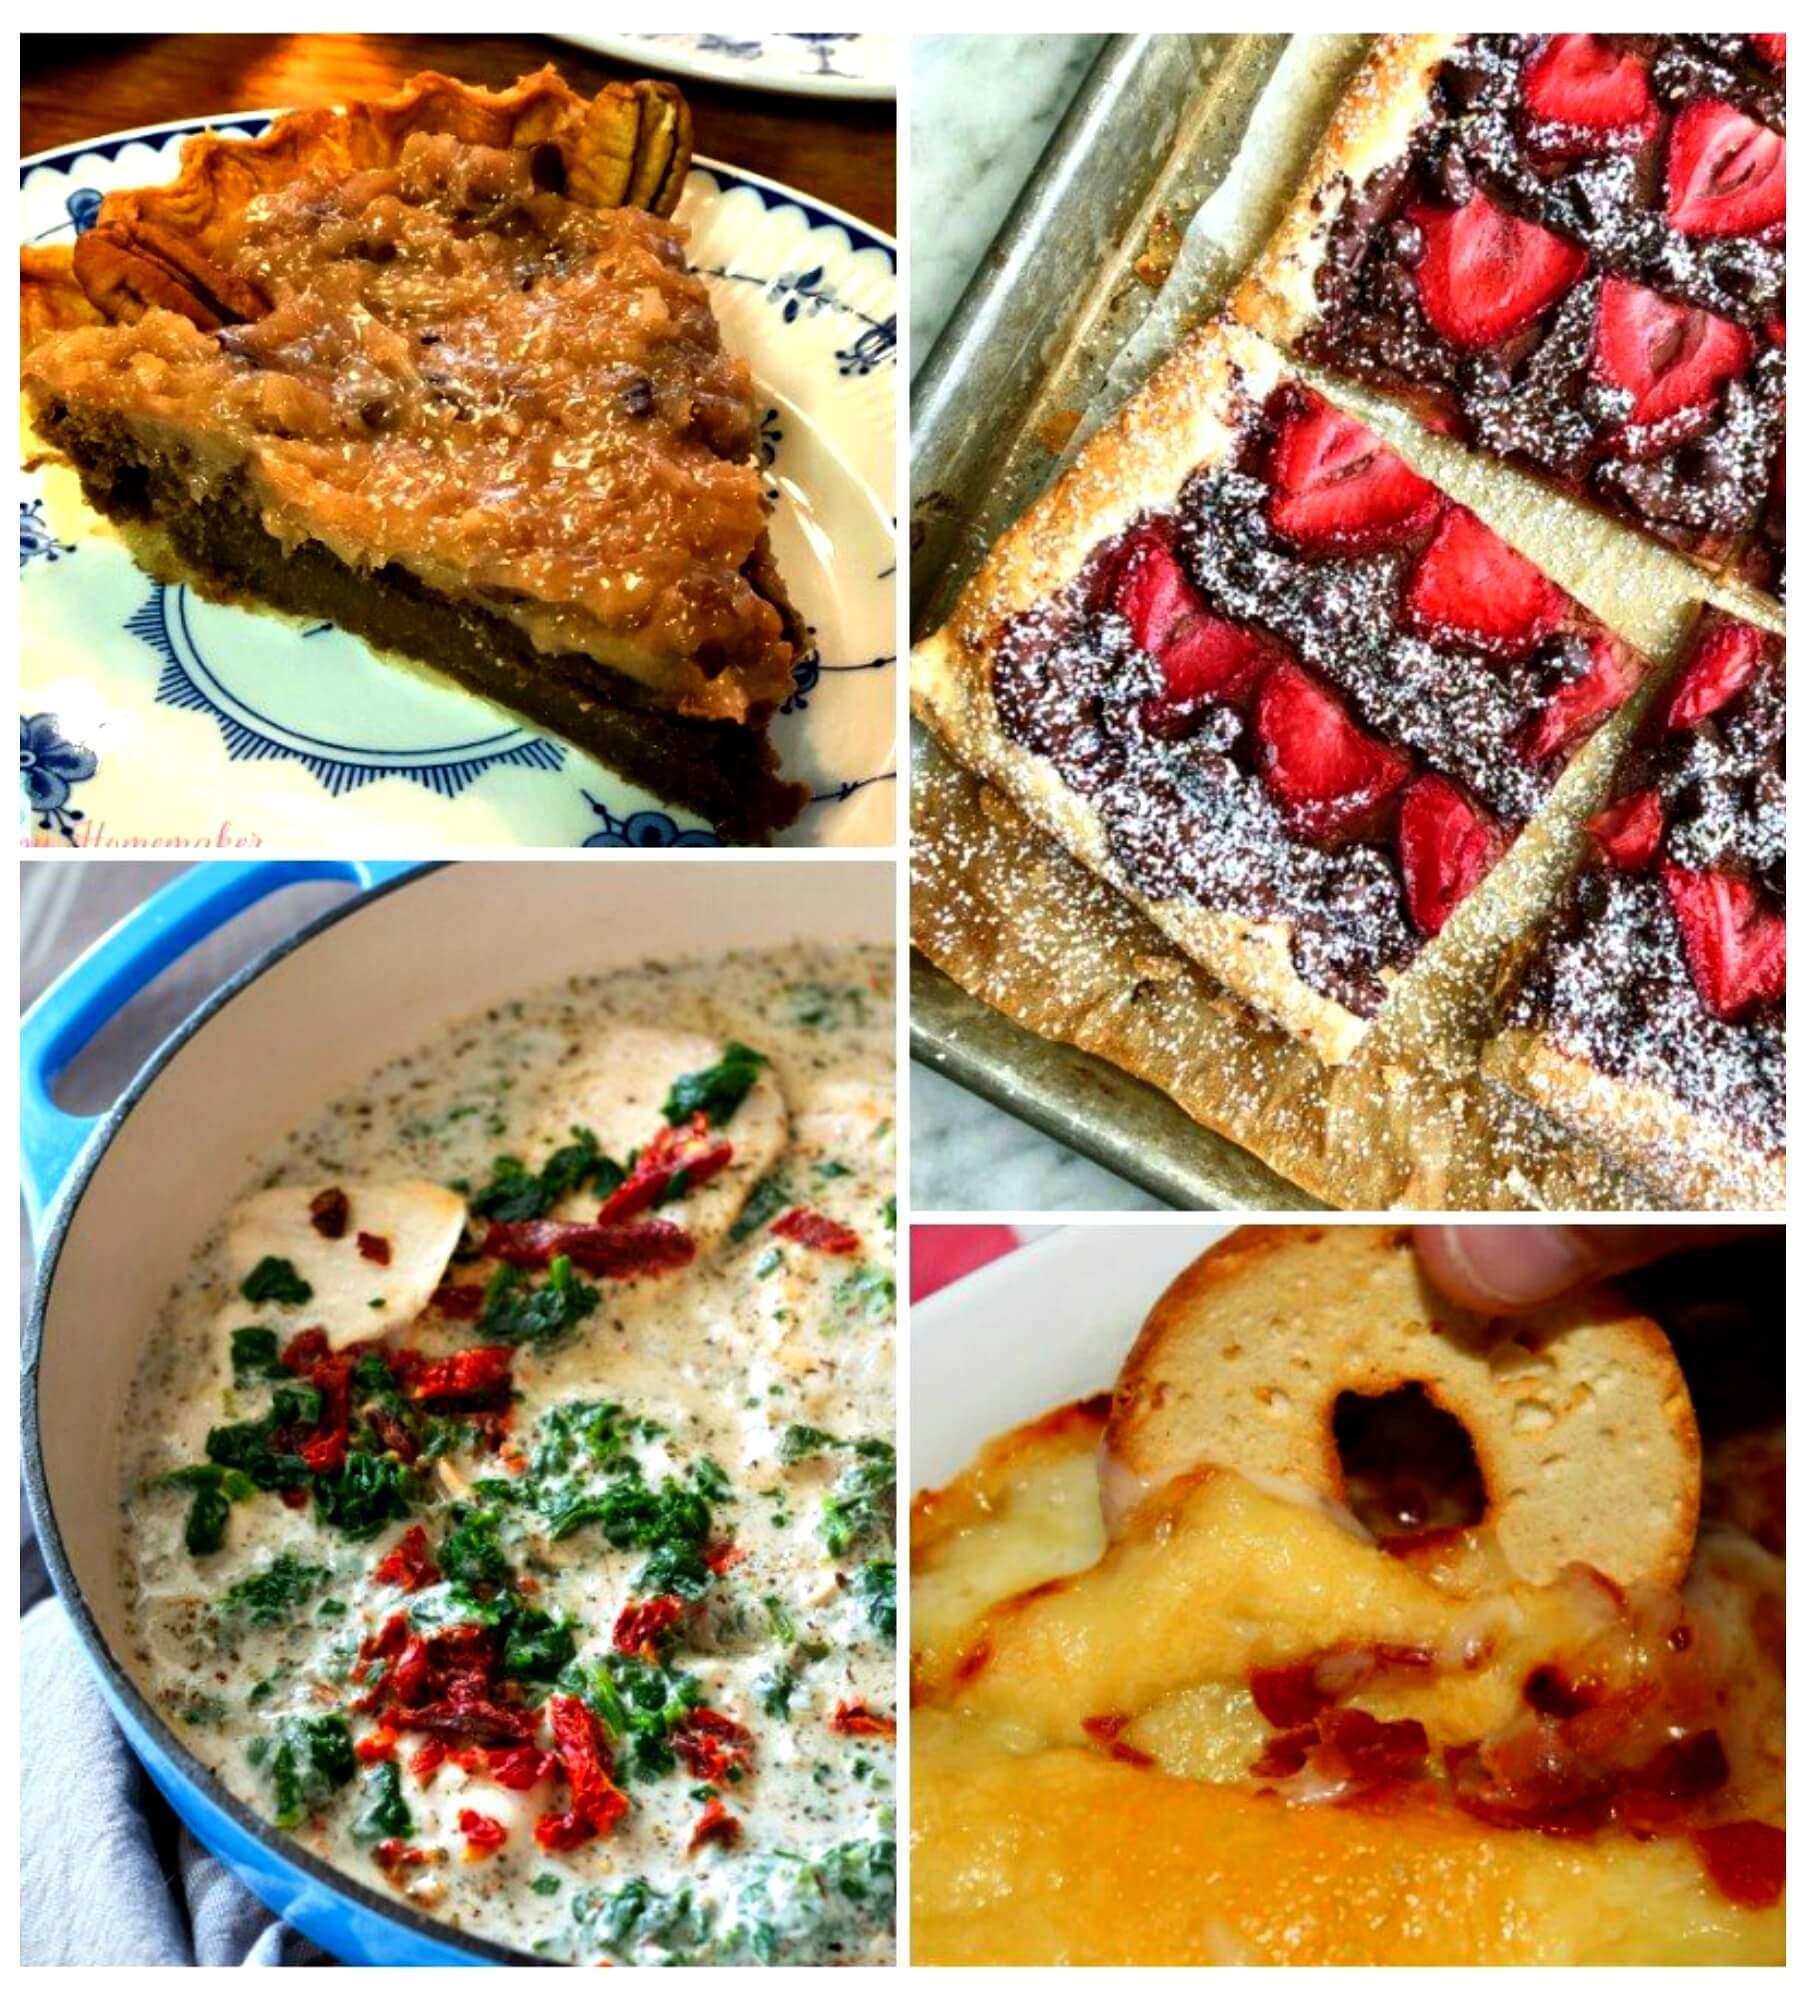 Meal Plan Monday 202 collage